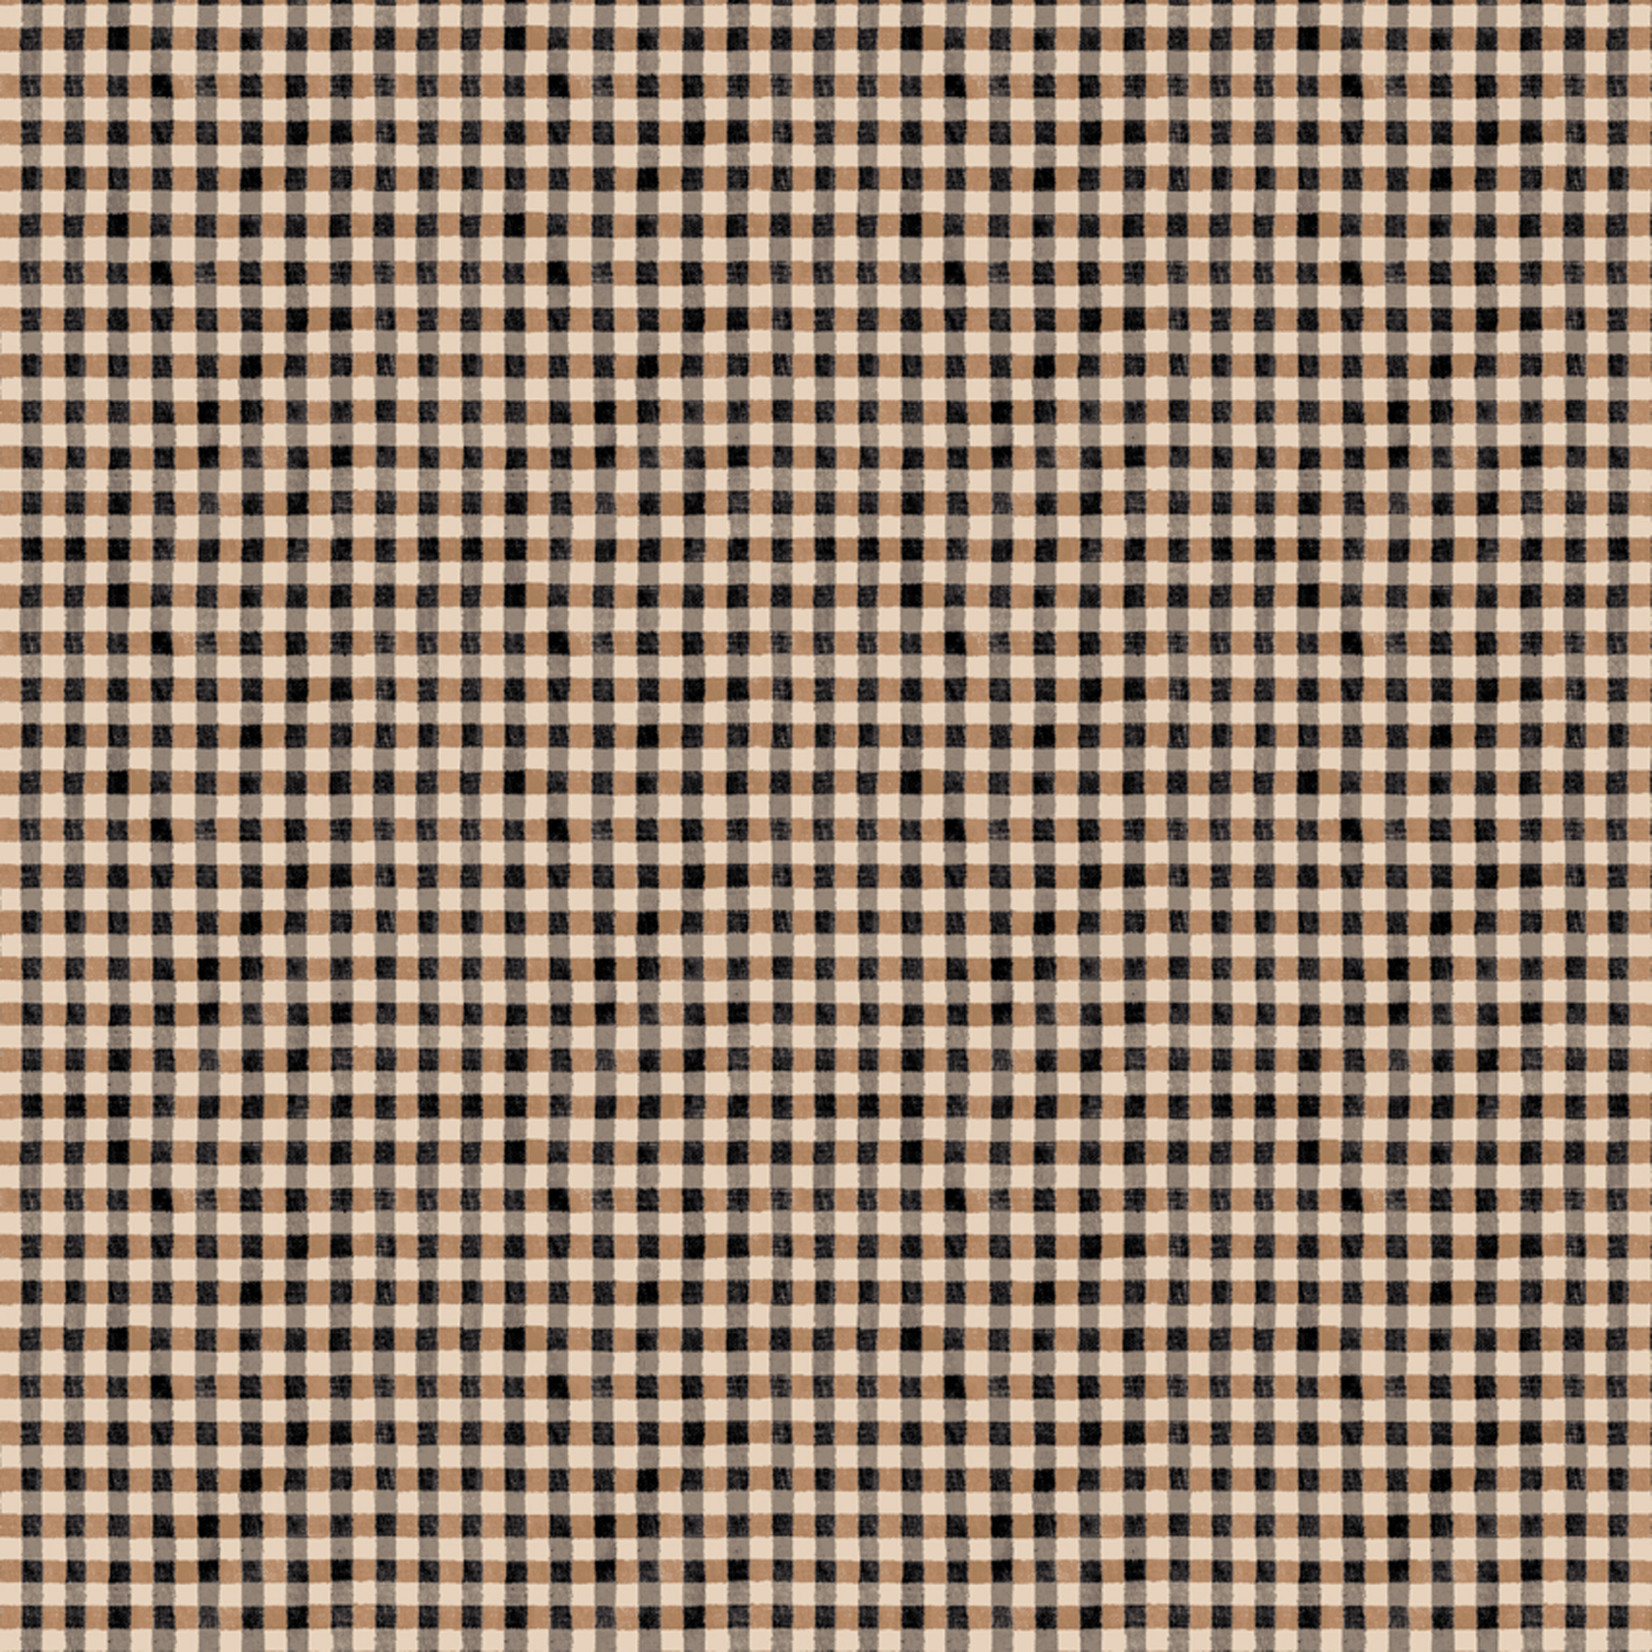 Windham Fabrics Certified Delicious - Mini Gingham - Black